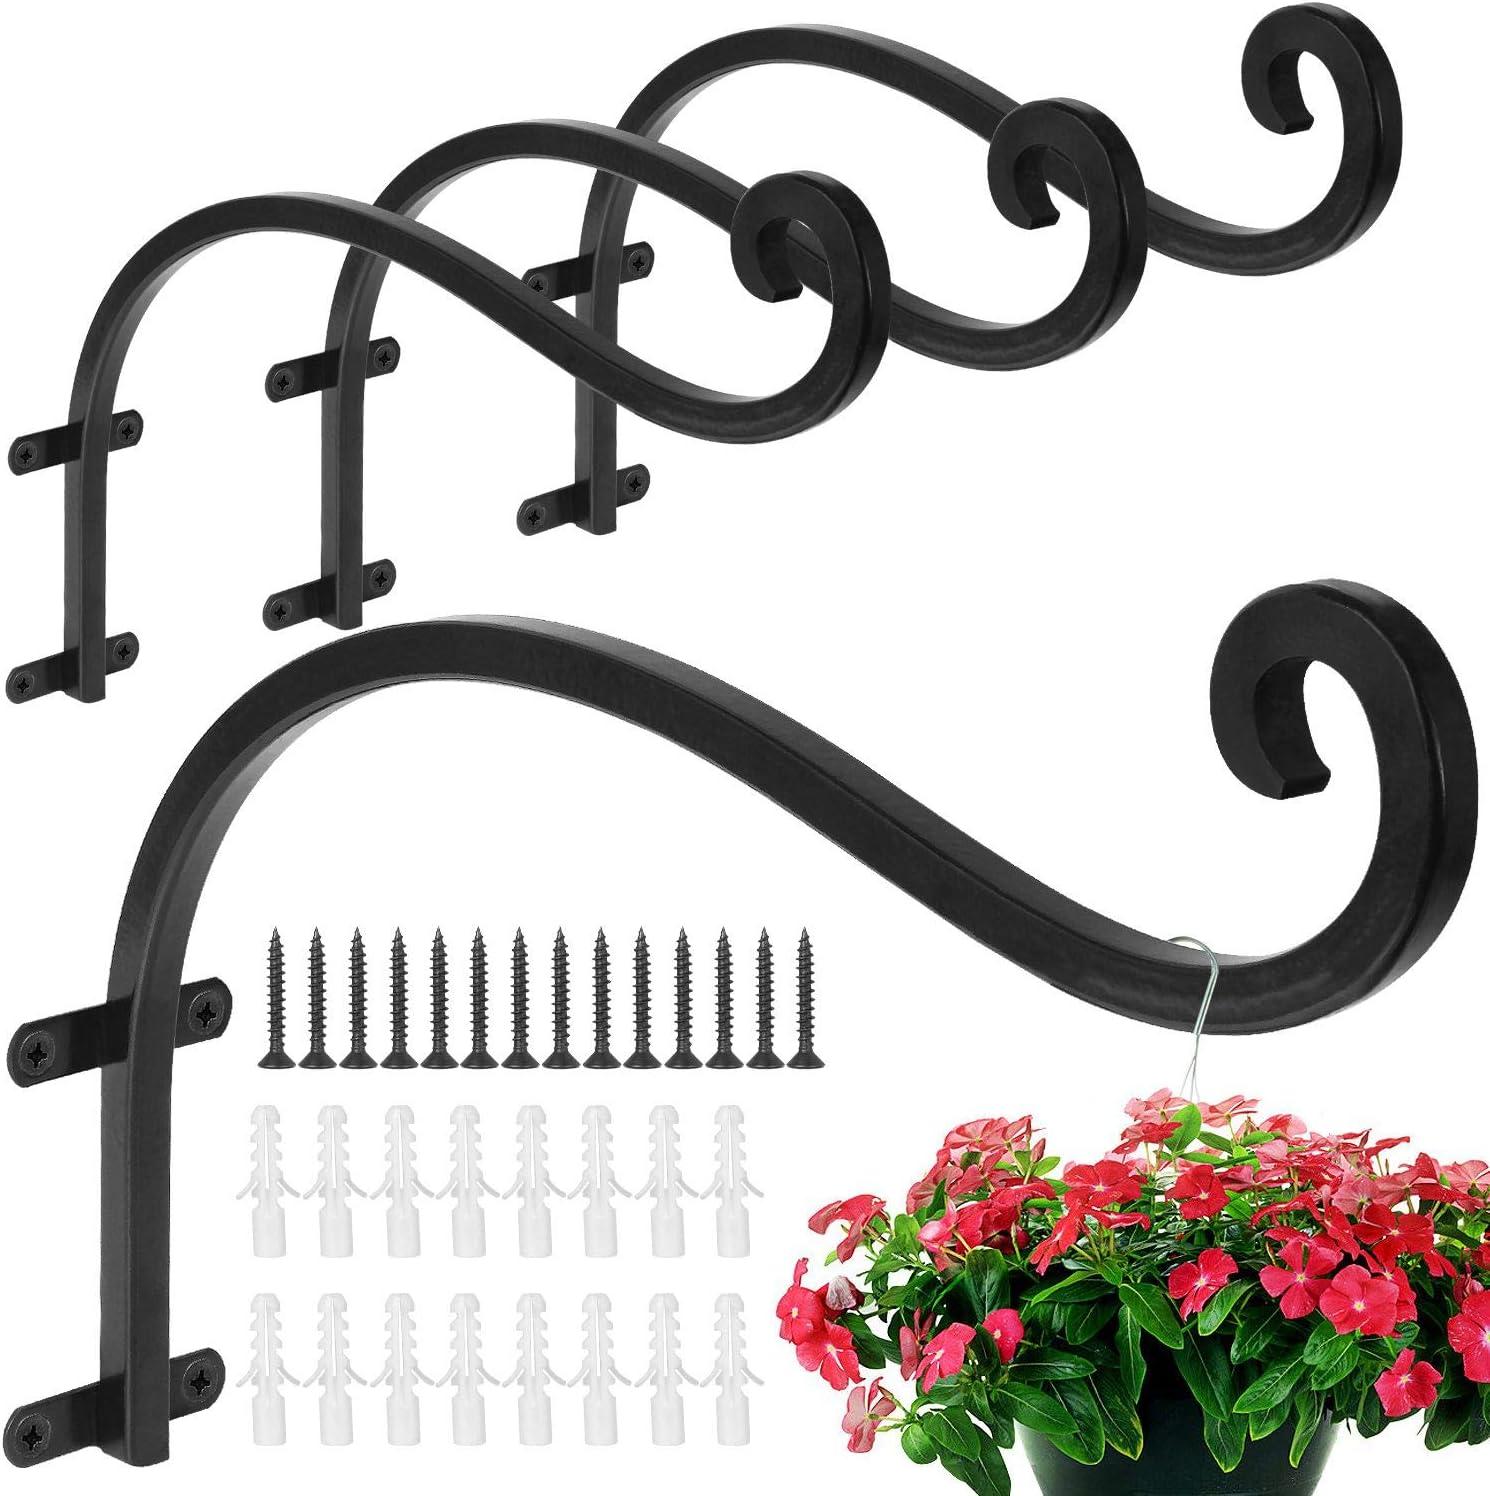 4pcs//10pcs Metal Hanging Baskets Brackets Hooks Garden Plant Wall Hanger Bracket